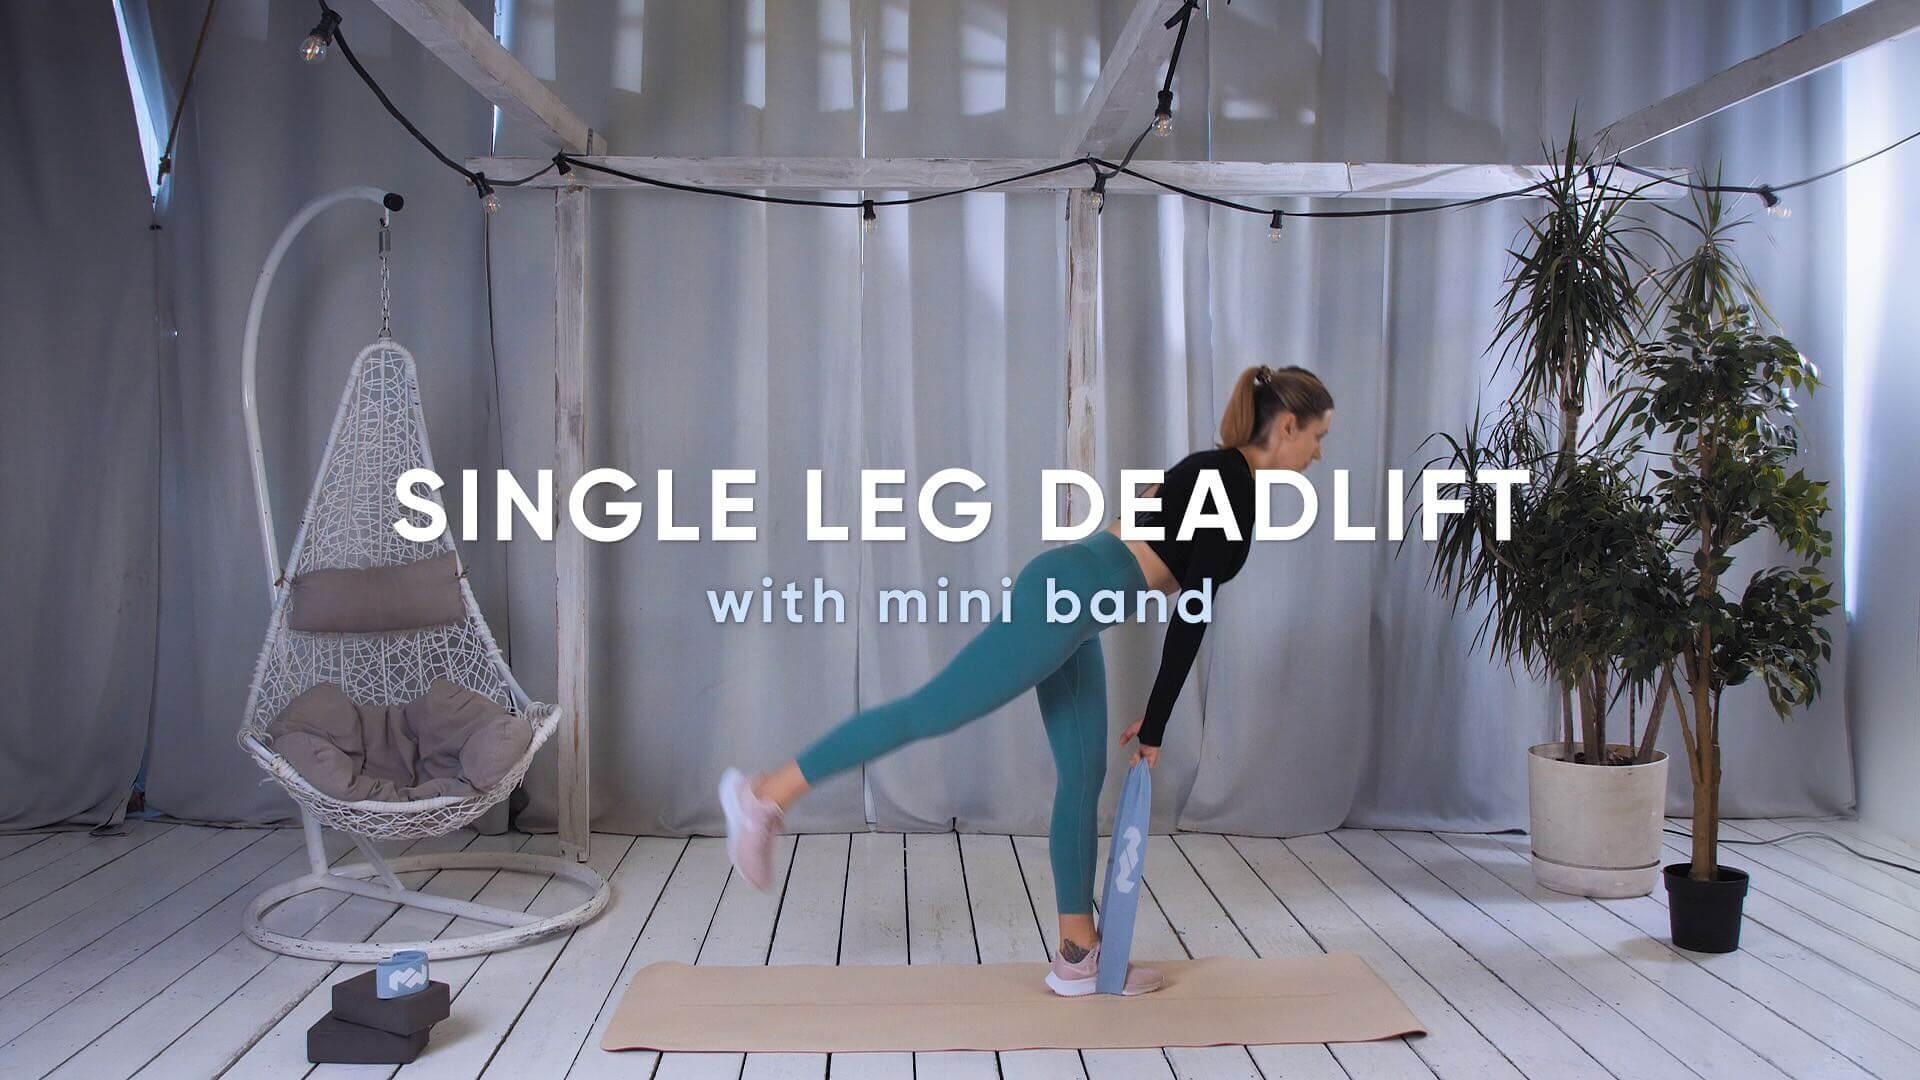 Single leg deadlift with mini band